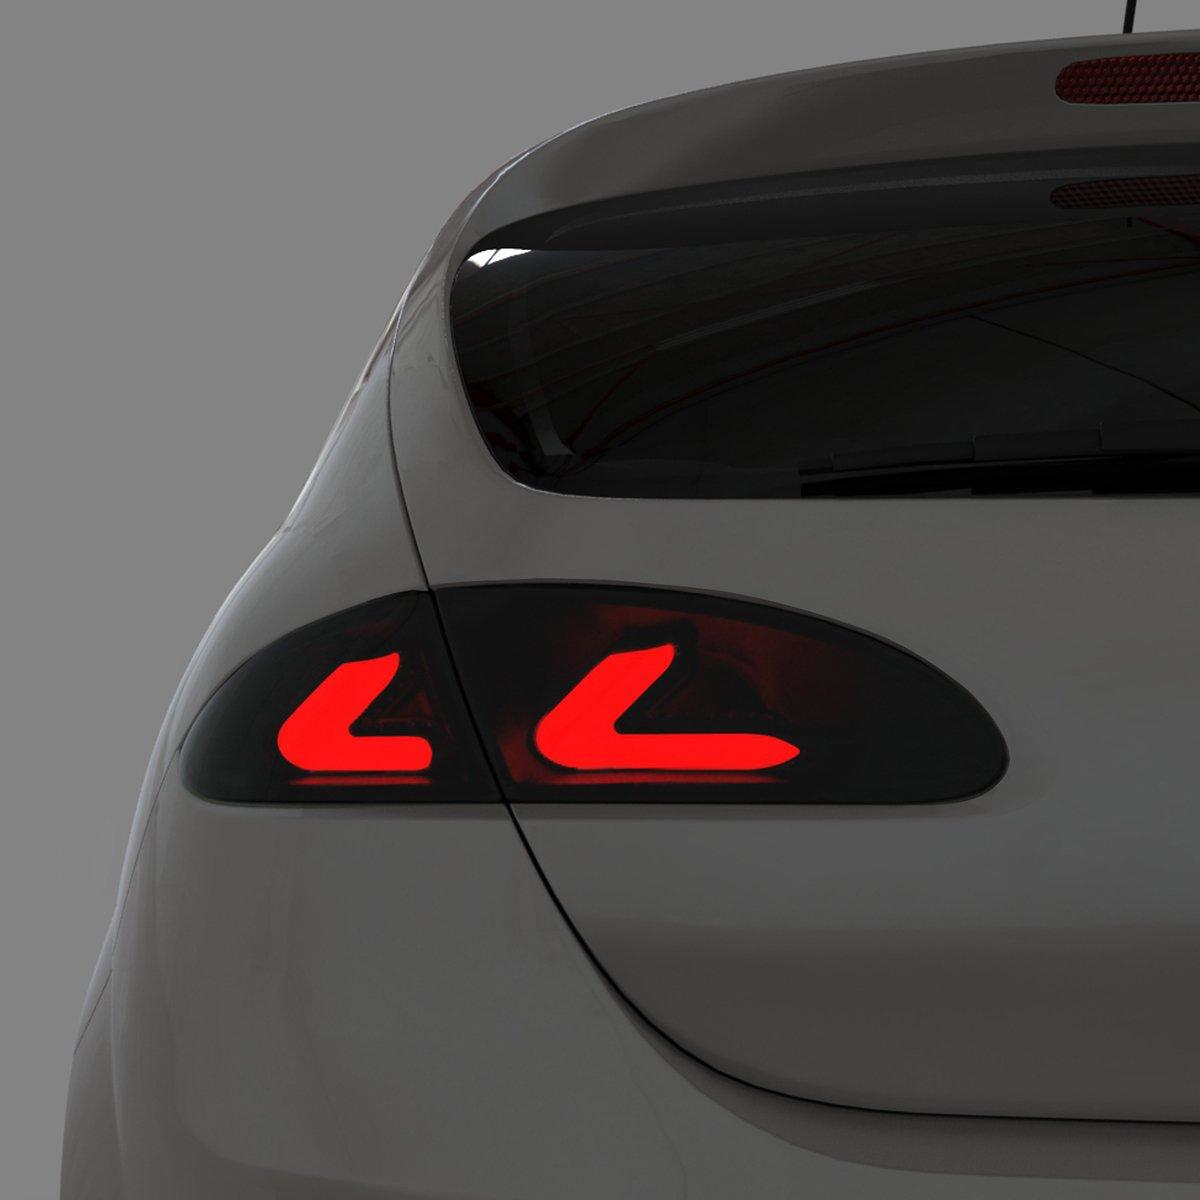 Dectane RSI07LLBS carDNA - Faros traseros LED para Seat León 1P Lightbar (modelos de 2005 a 2009), color negro y gris oscuro: Amazon.es: Coche y moto